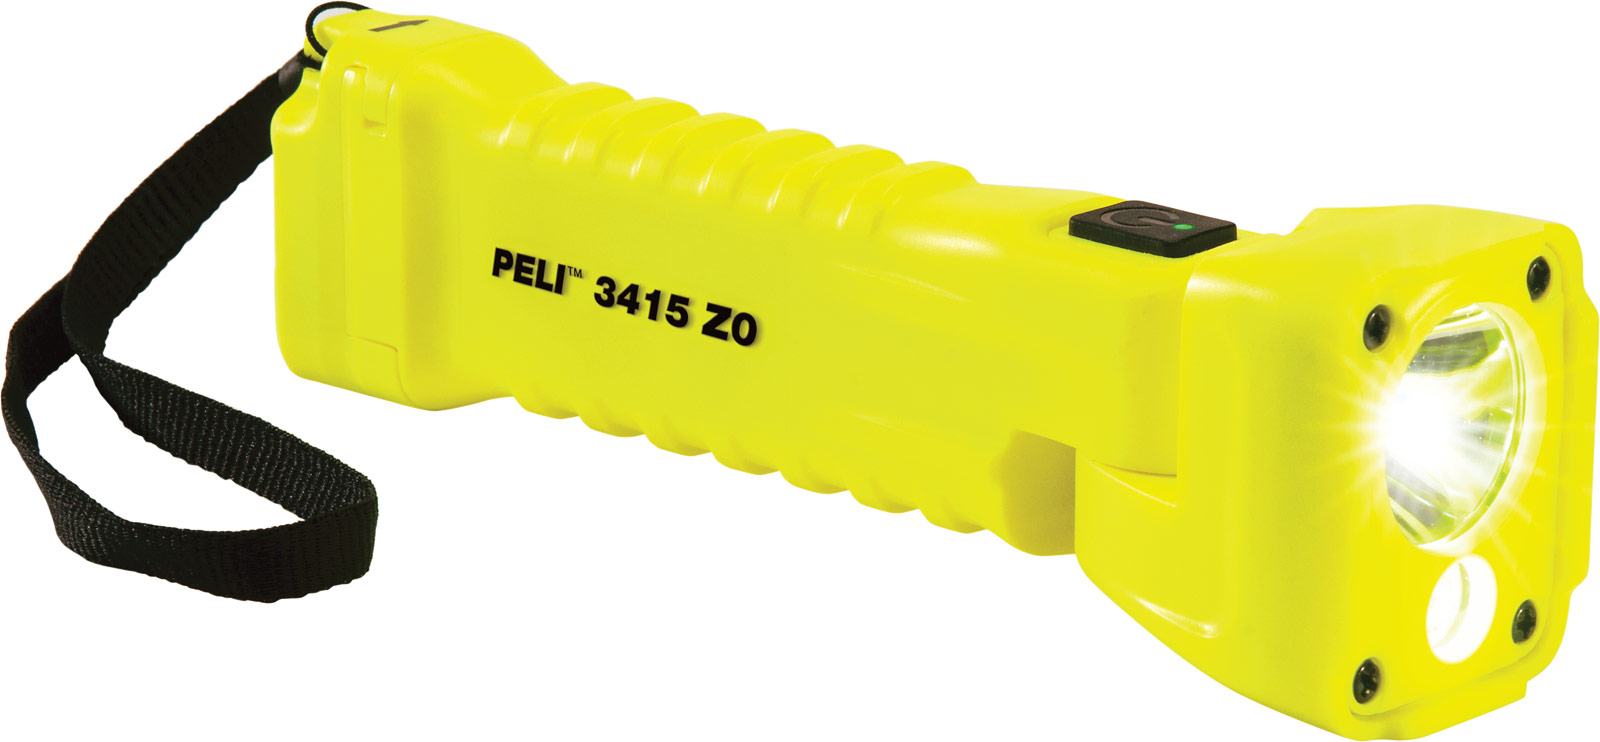 peli 3415z0 zone atex torch safety light